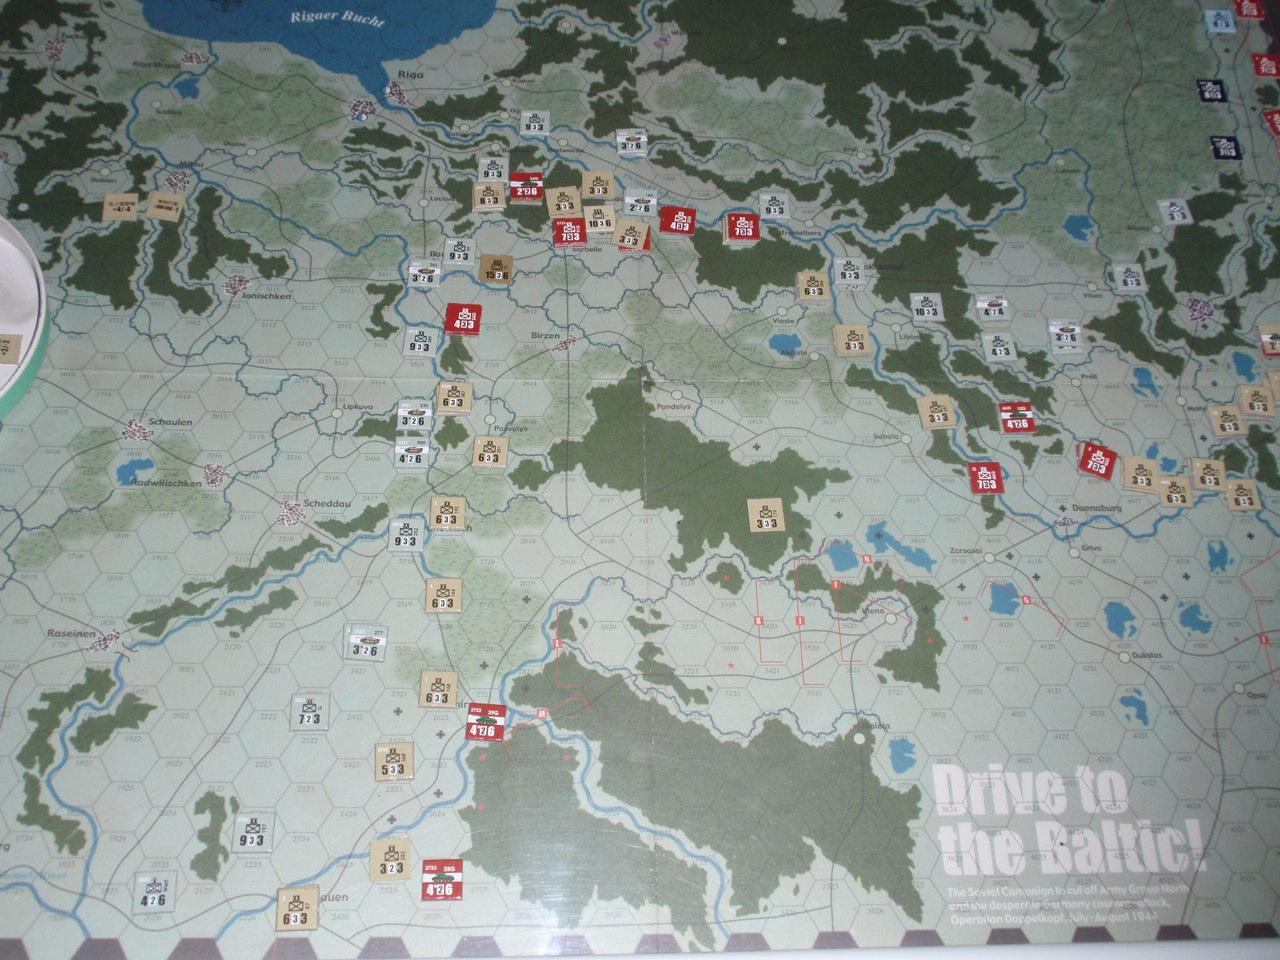 MIH/CMJ「Drive to the Baltic!」をソロプレイ①_b0162202_1033178.jpg